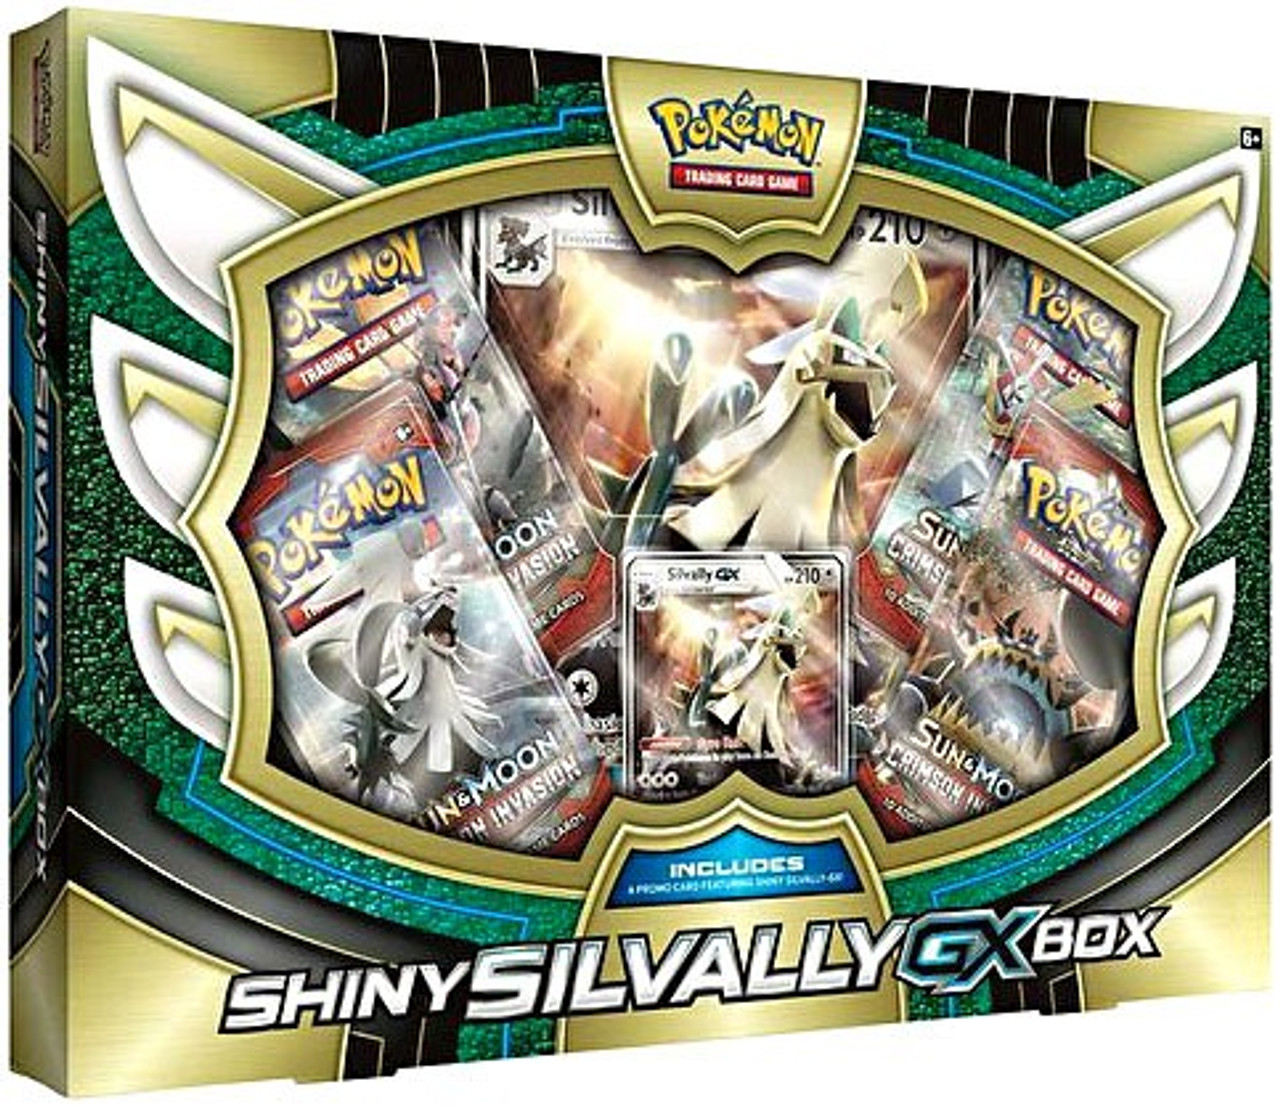 Pokemon Trading Card Game Shiny Silvally-GX Box Pokemon